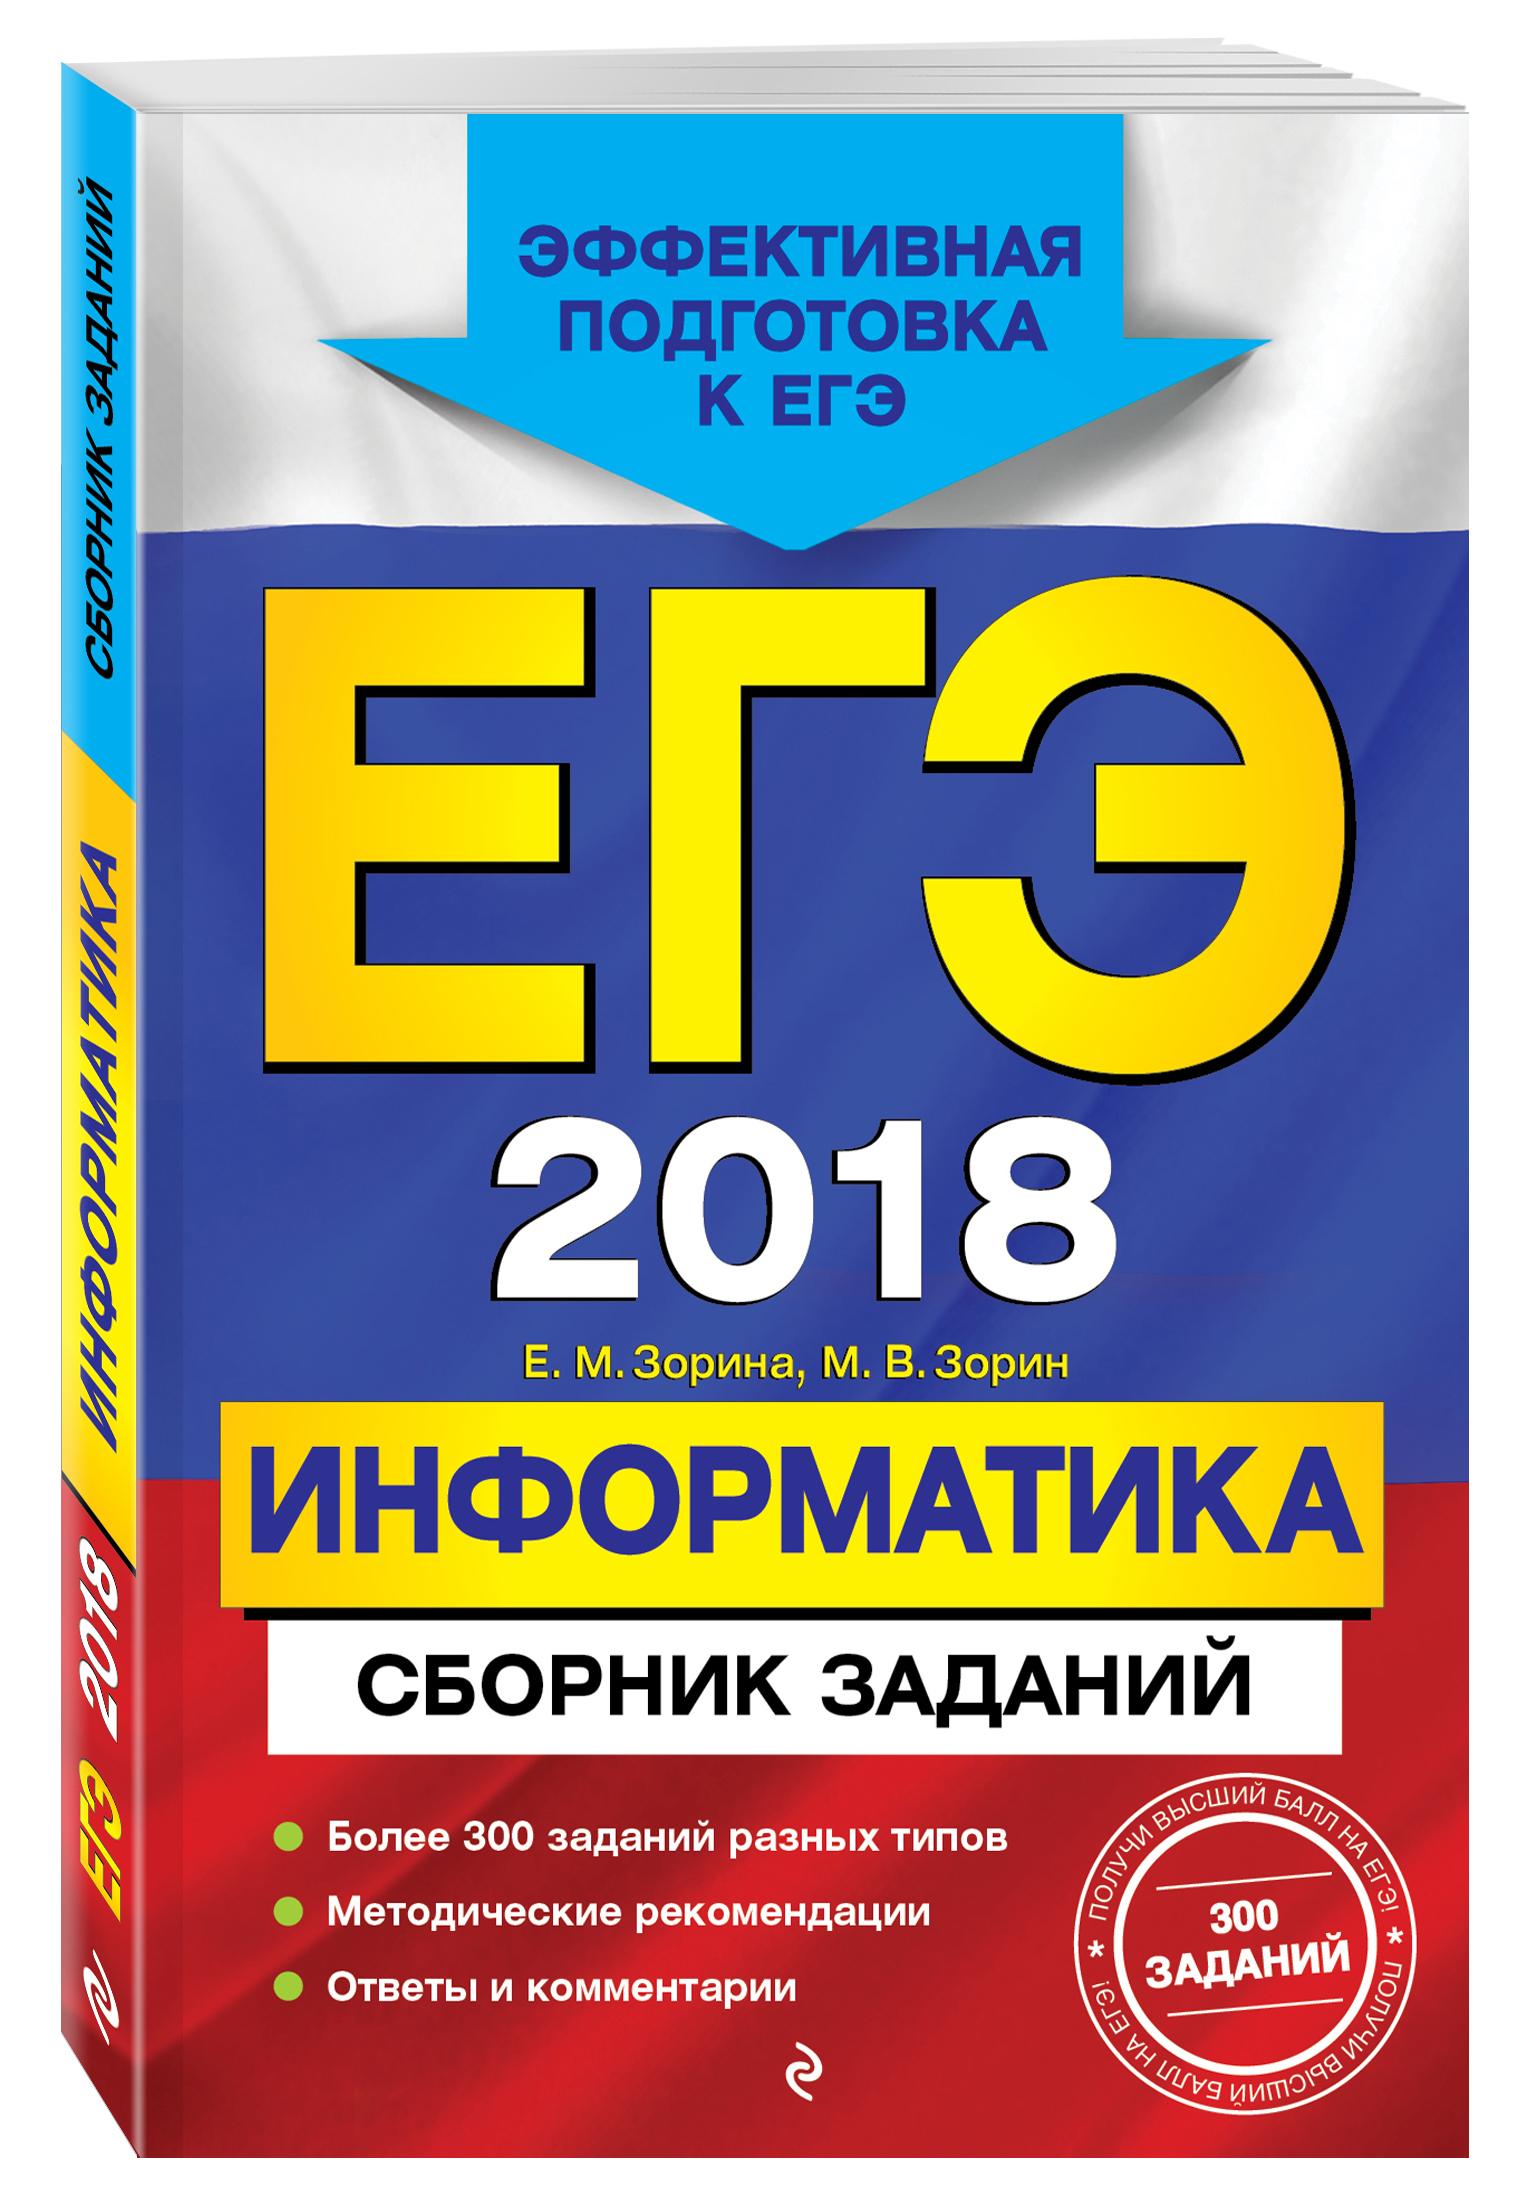 ЕГЭ-2018. Информатика. Сборник заданий ( Зорина Е.М., Зорин М.В.  )